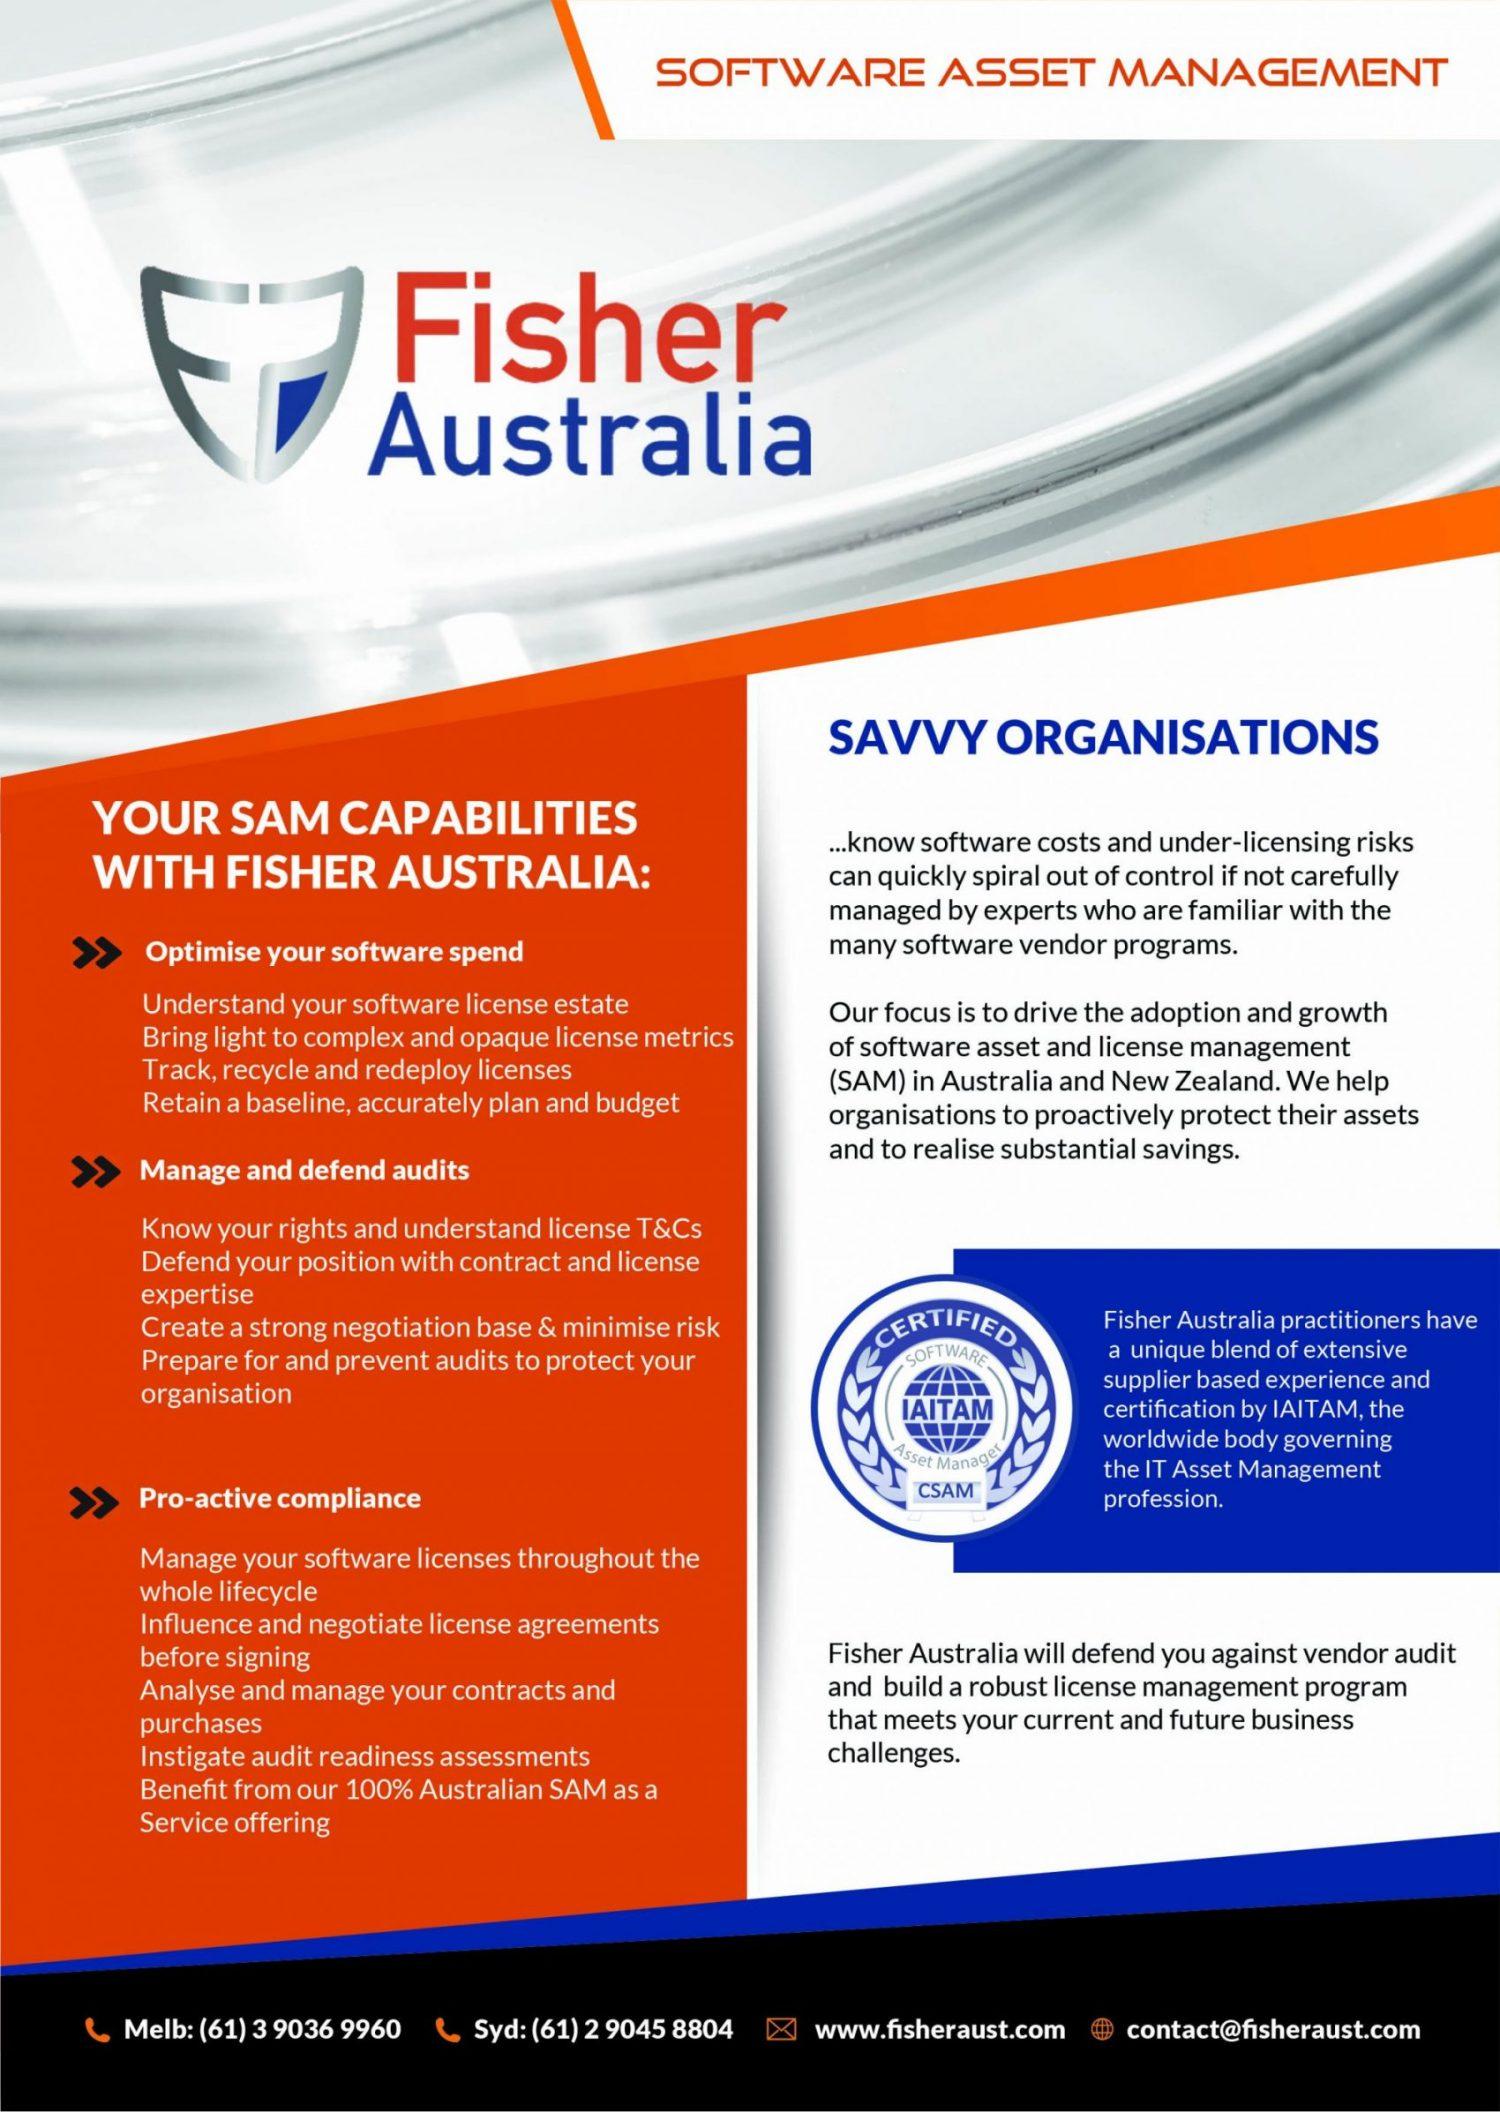 About Fisher Australia | Software Asset Management